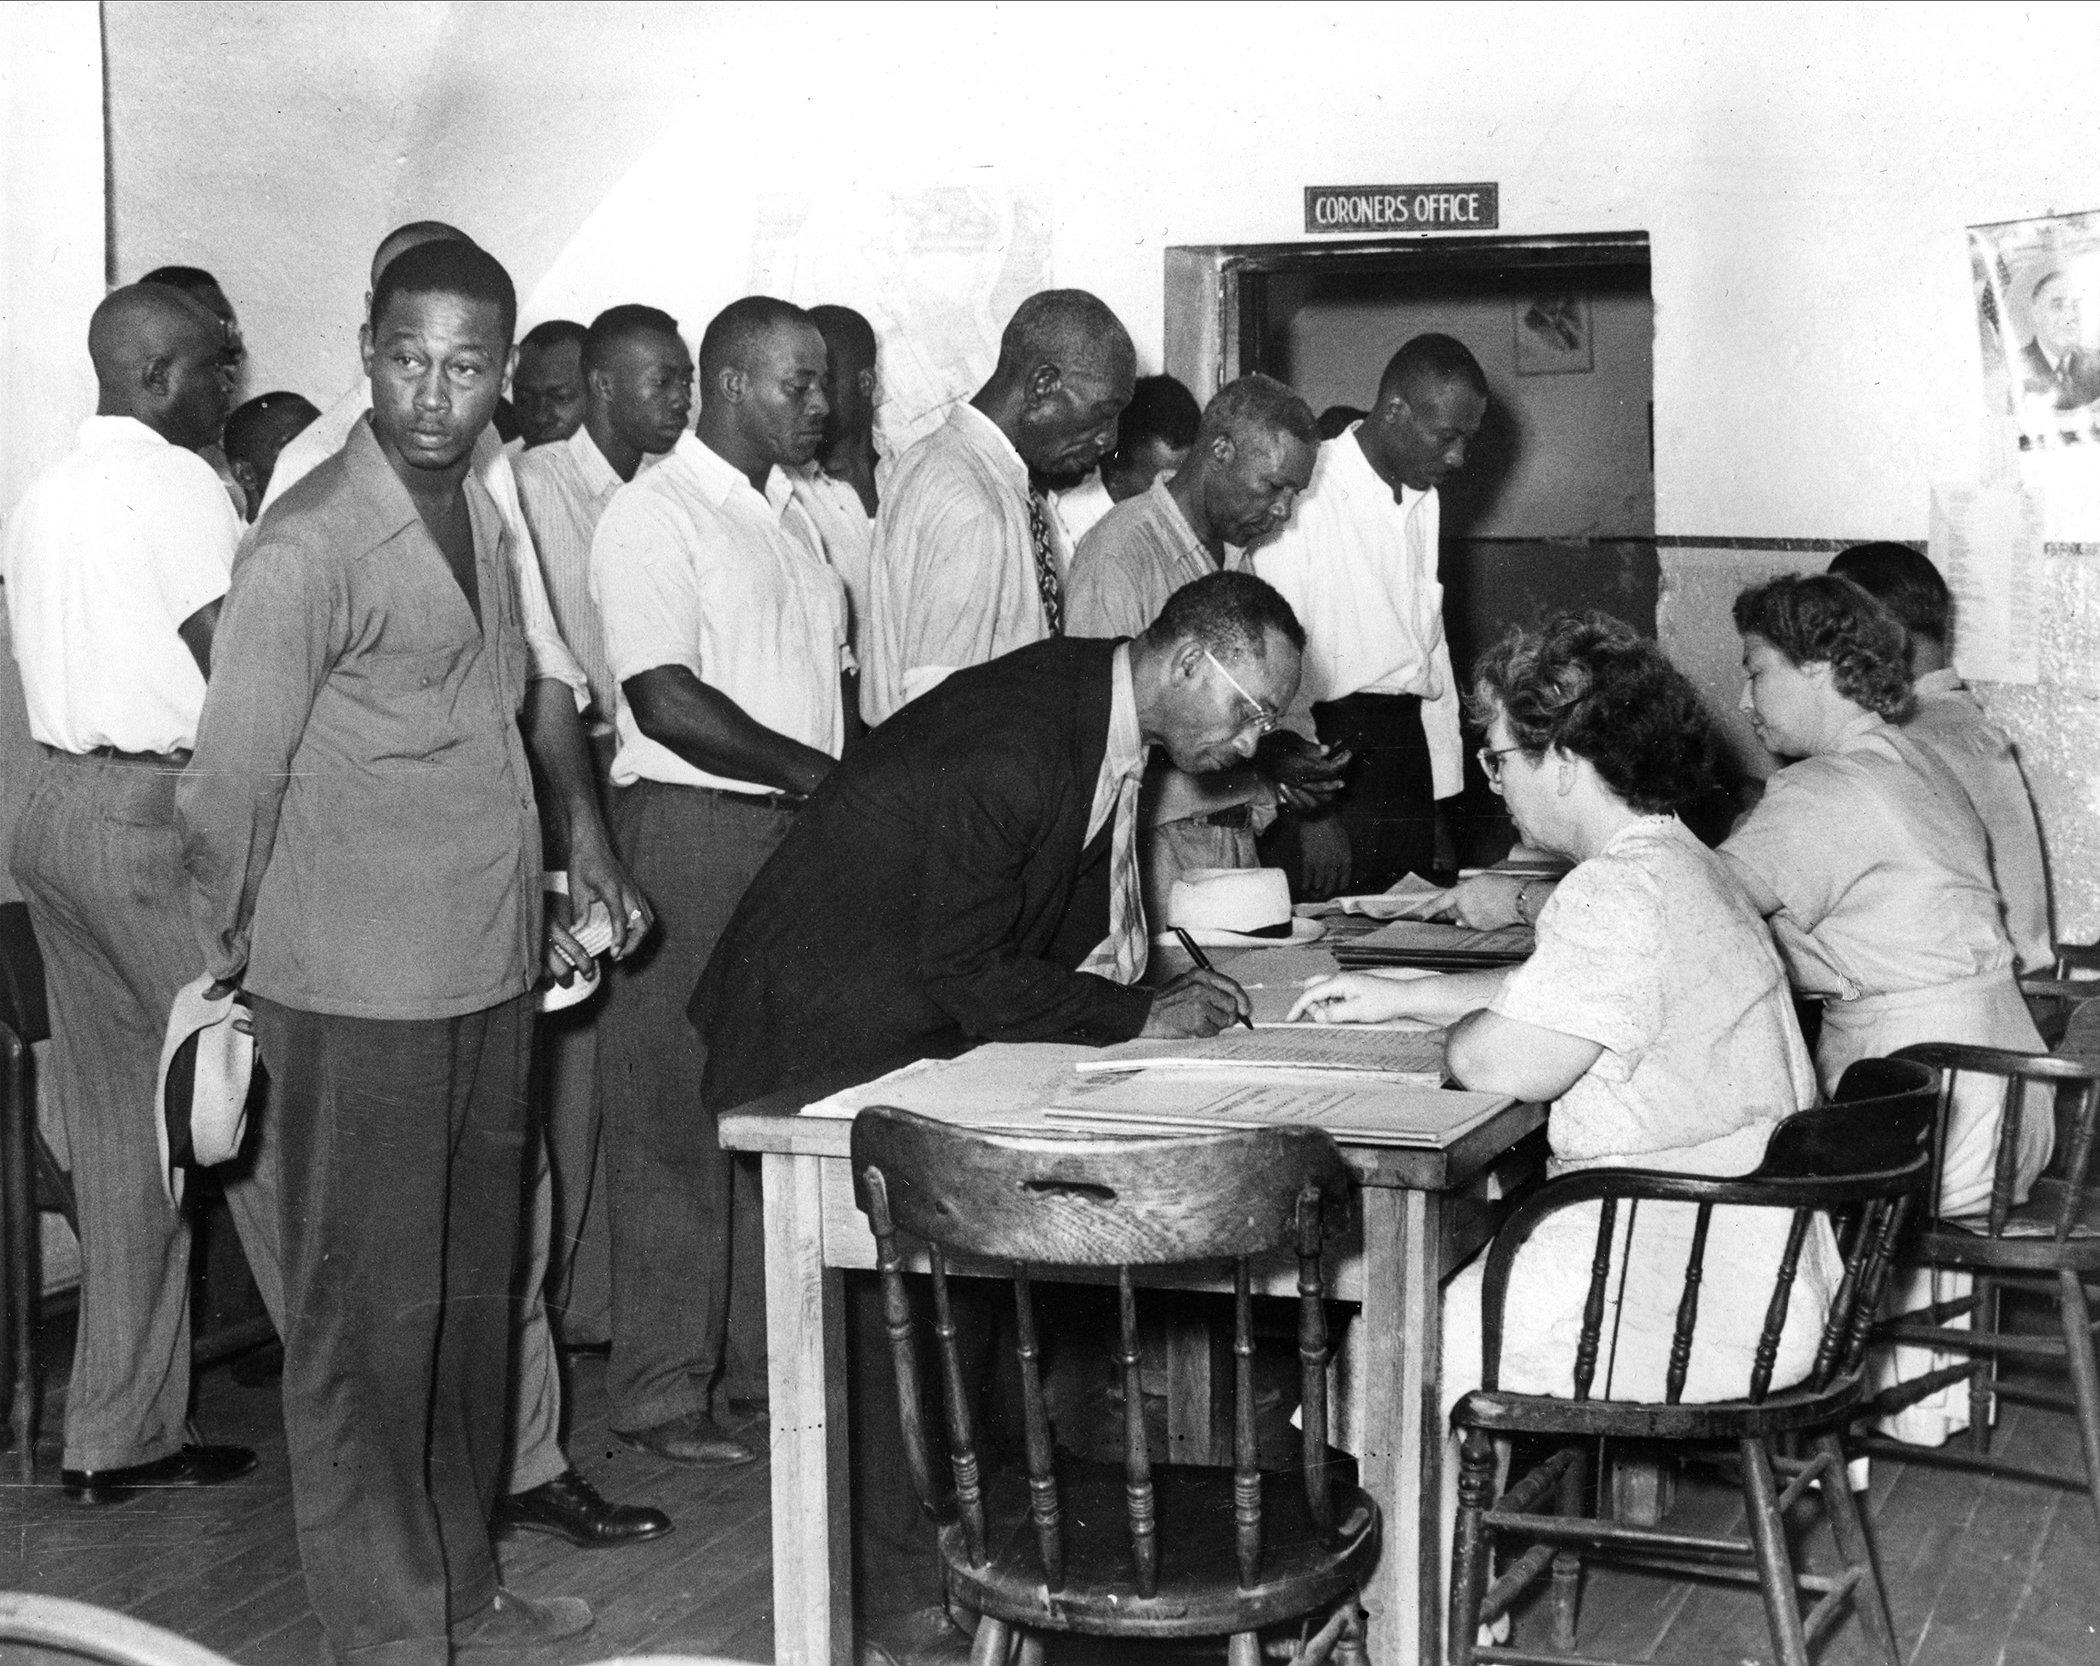 African-Americans-Voting-Rights-Registering-To-Vote-002.jpg